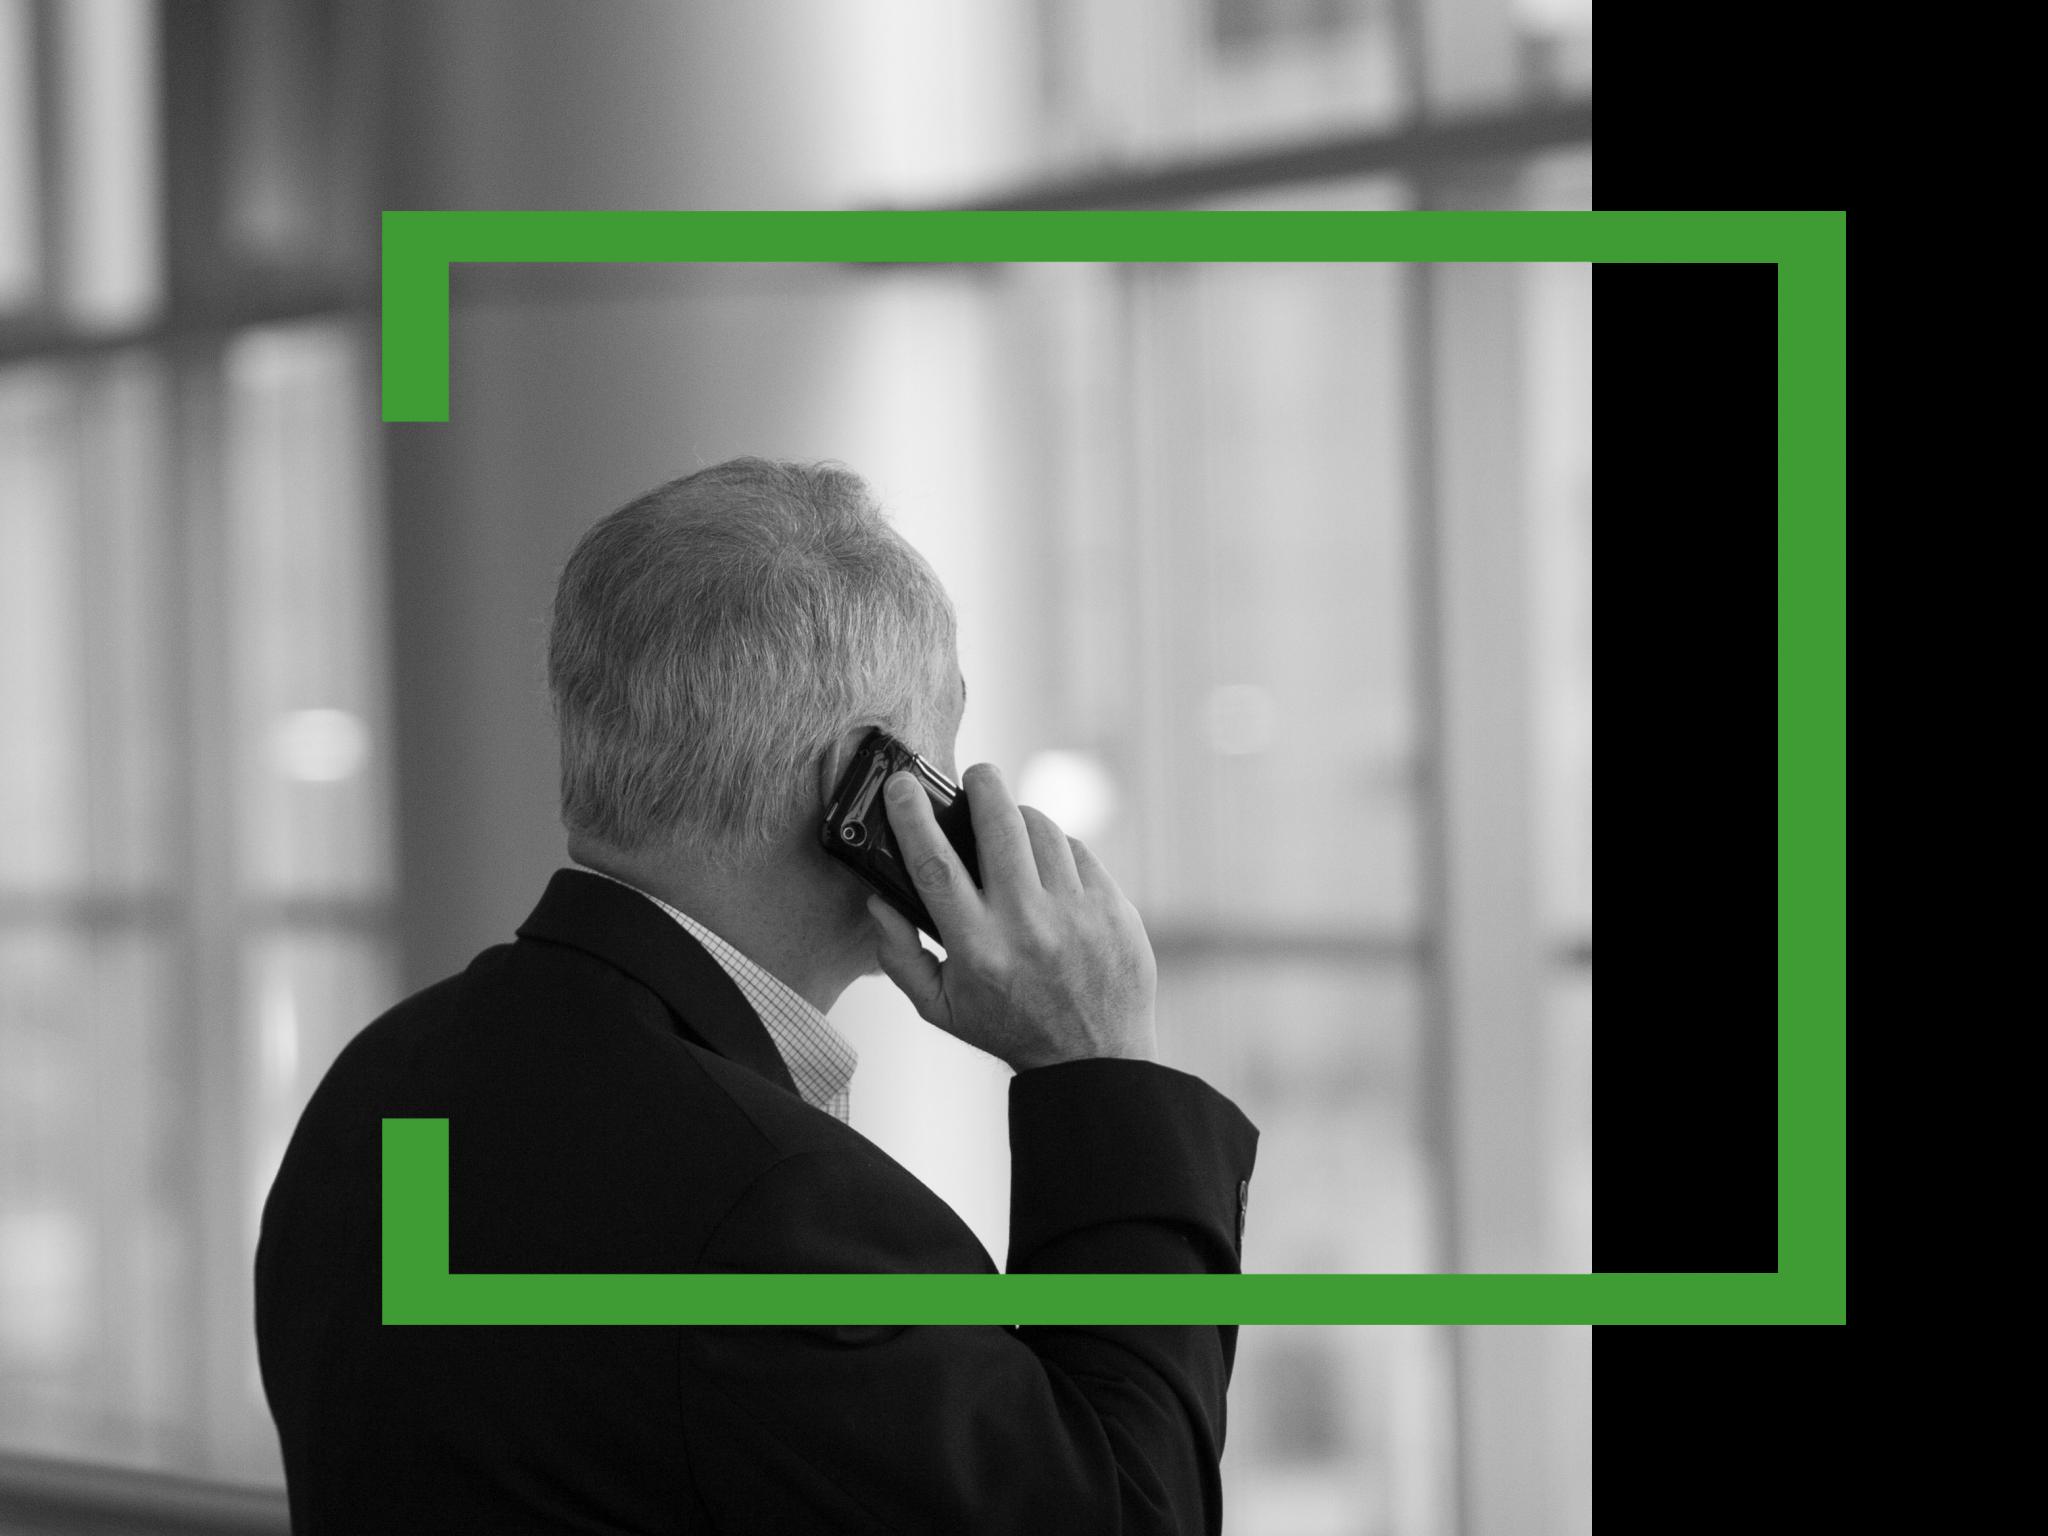 Image of man speaking on phone